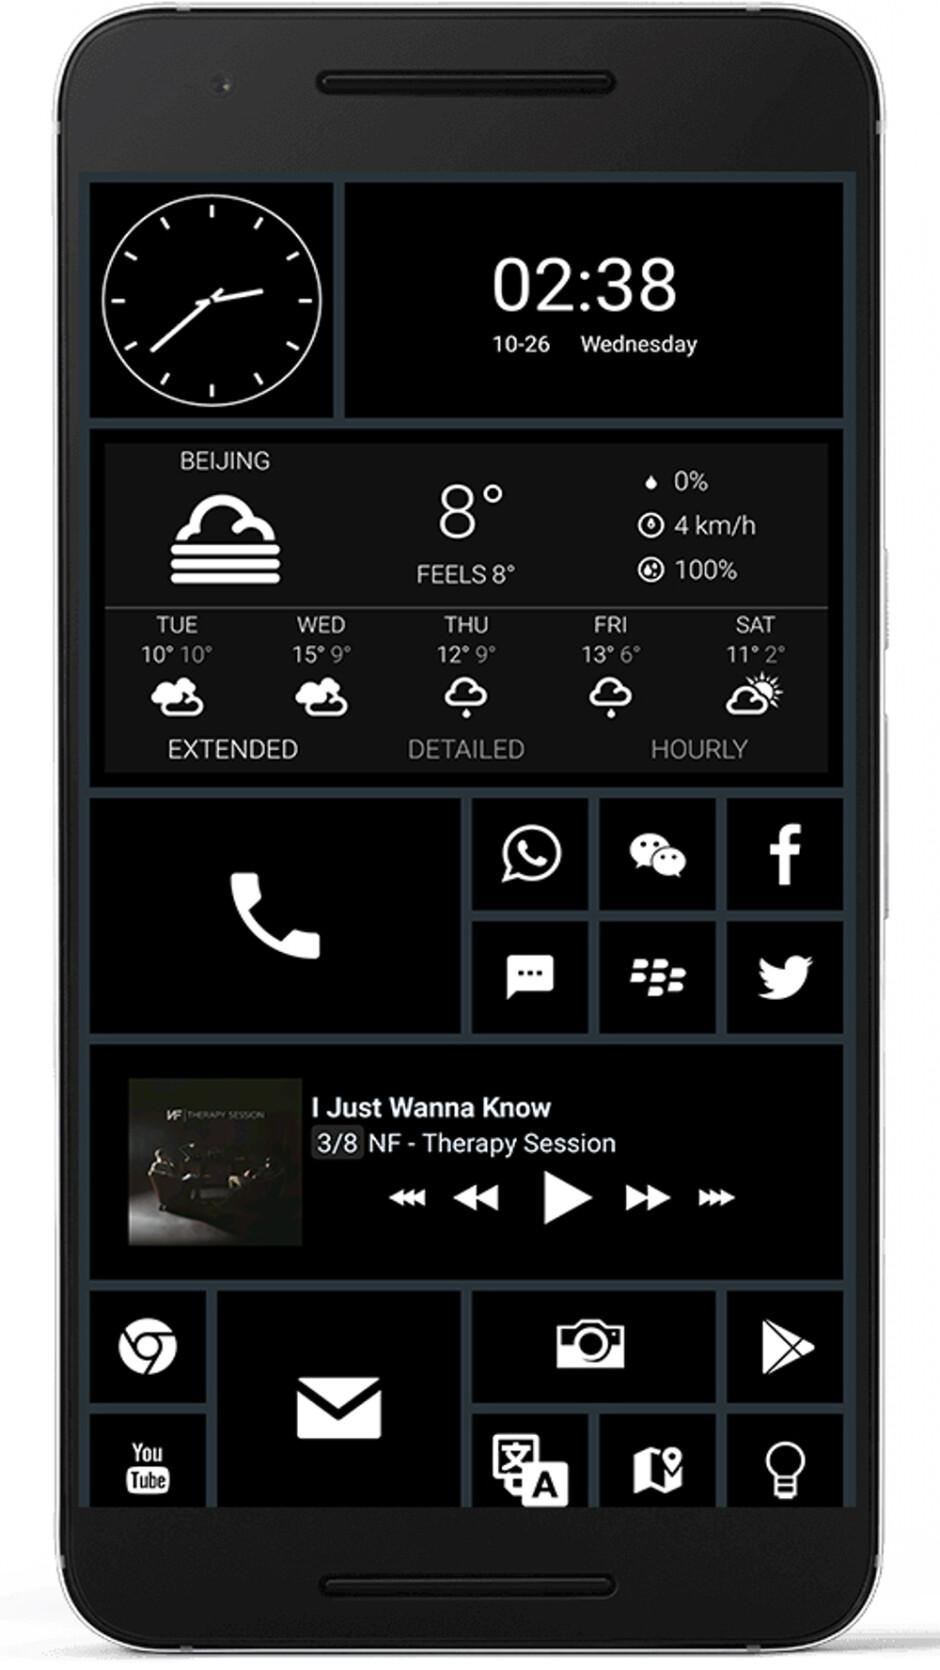 Last week's winner - MINDoSOUL - 10 beautiful custom Android home screen layouts #6